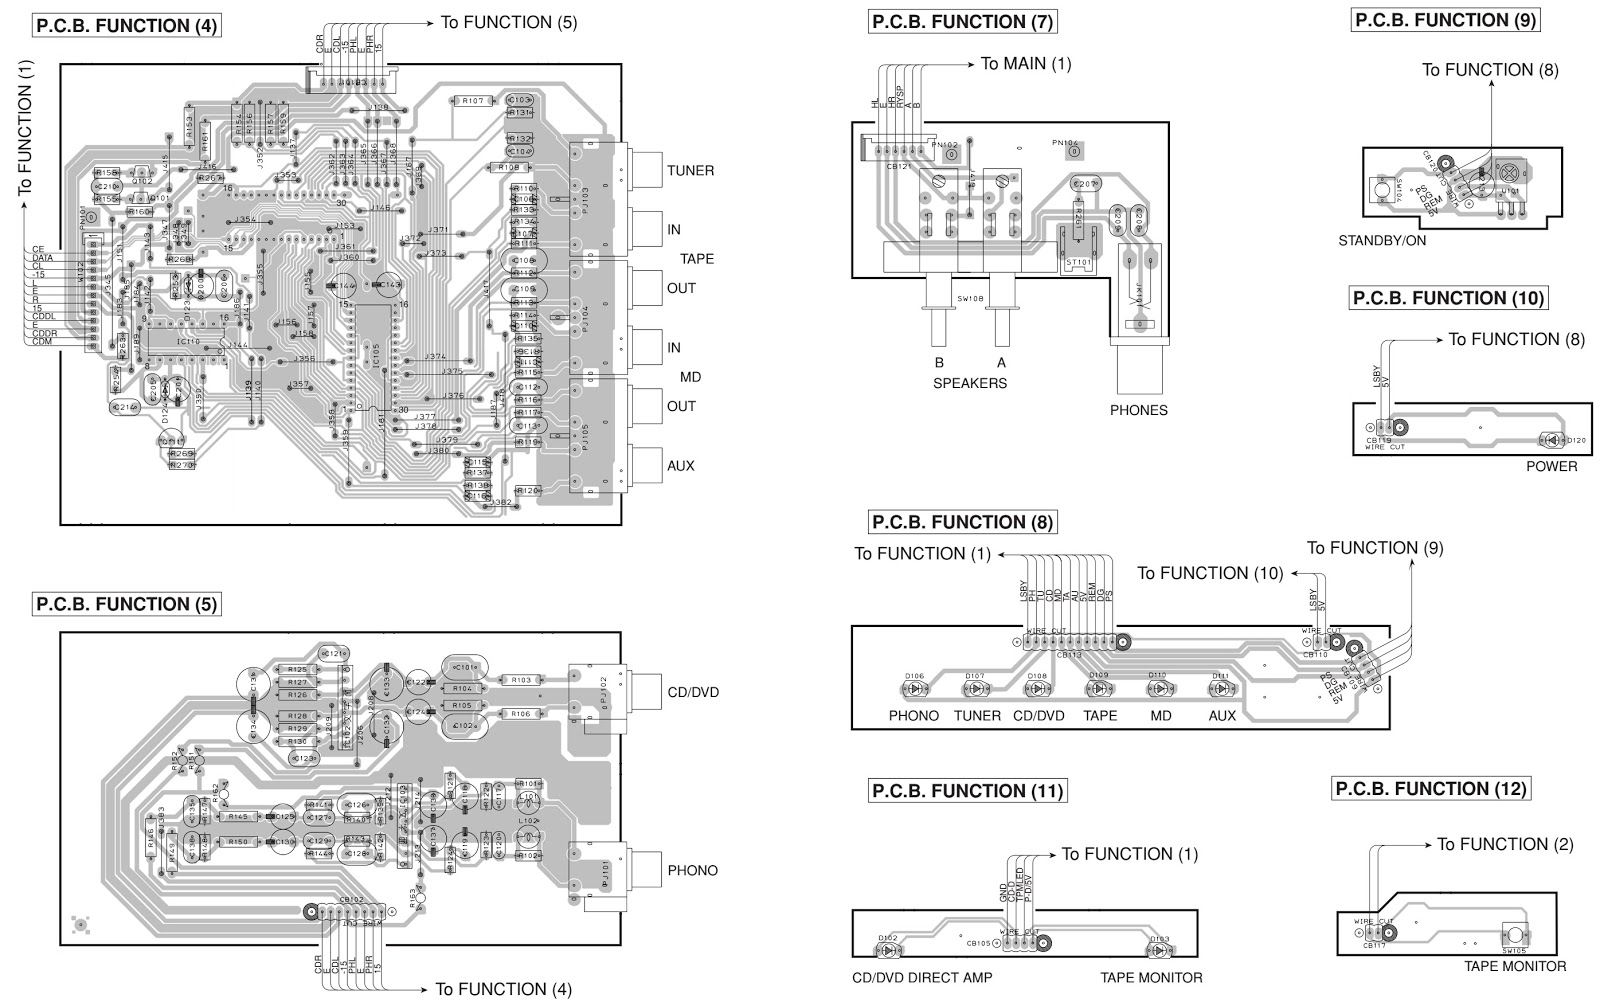 hight resolution of yamaha ax396 stereo amplifier circuit diagram yamaha guitar amp schematics yamaha yfz450 service manual